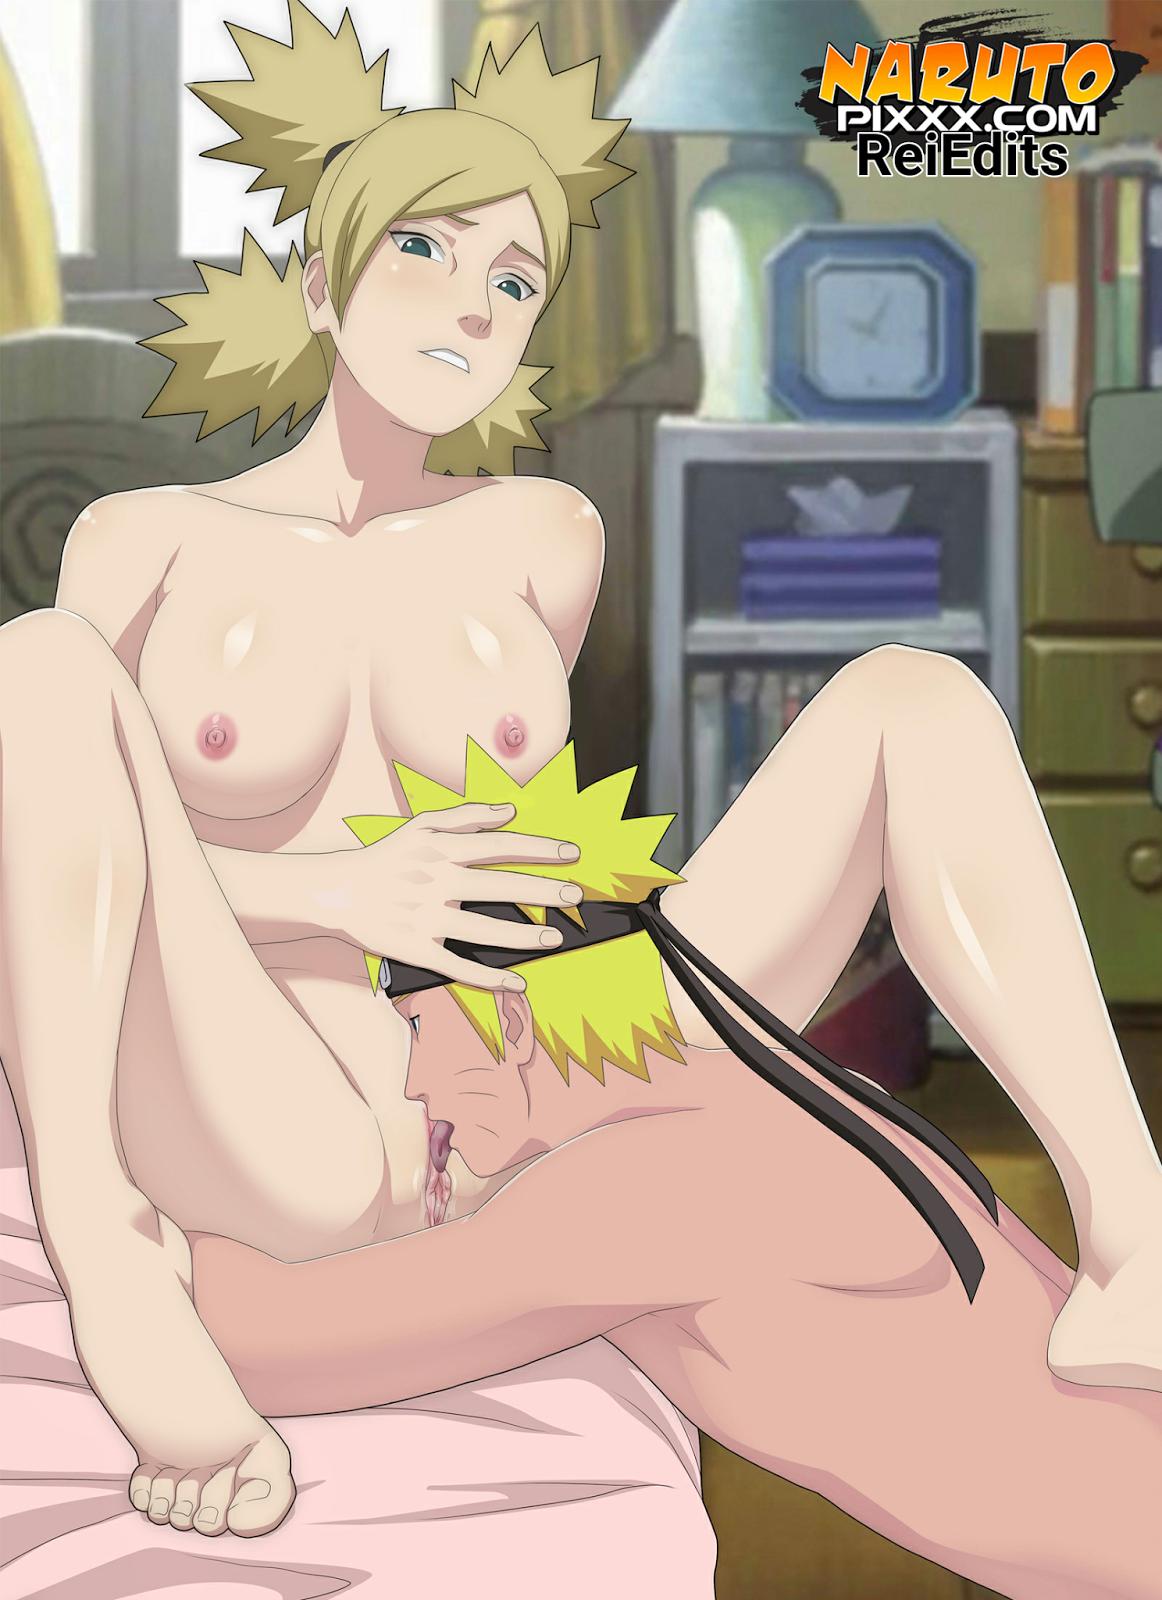 naruto-seks-temari